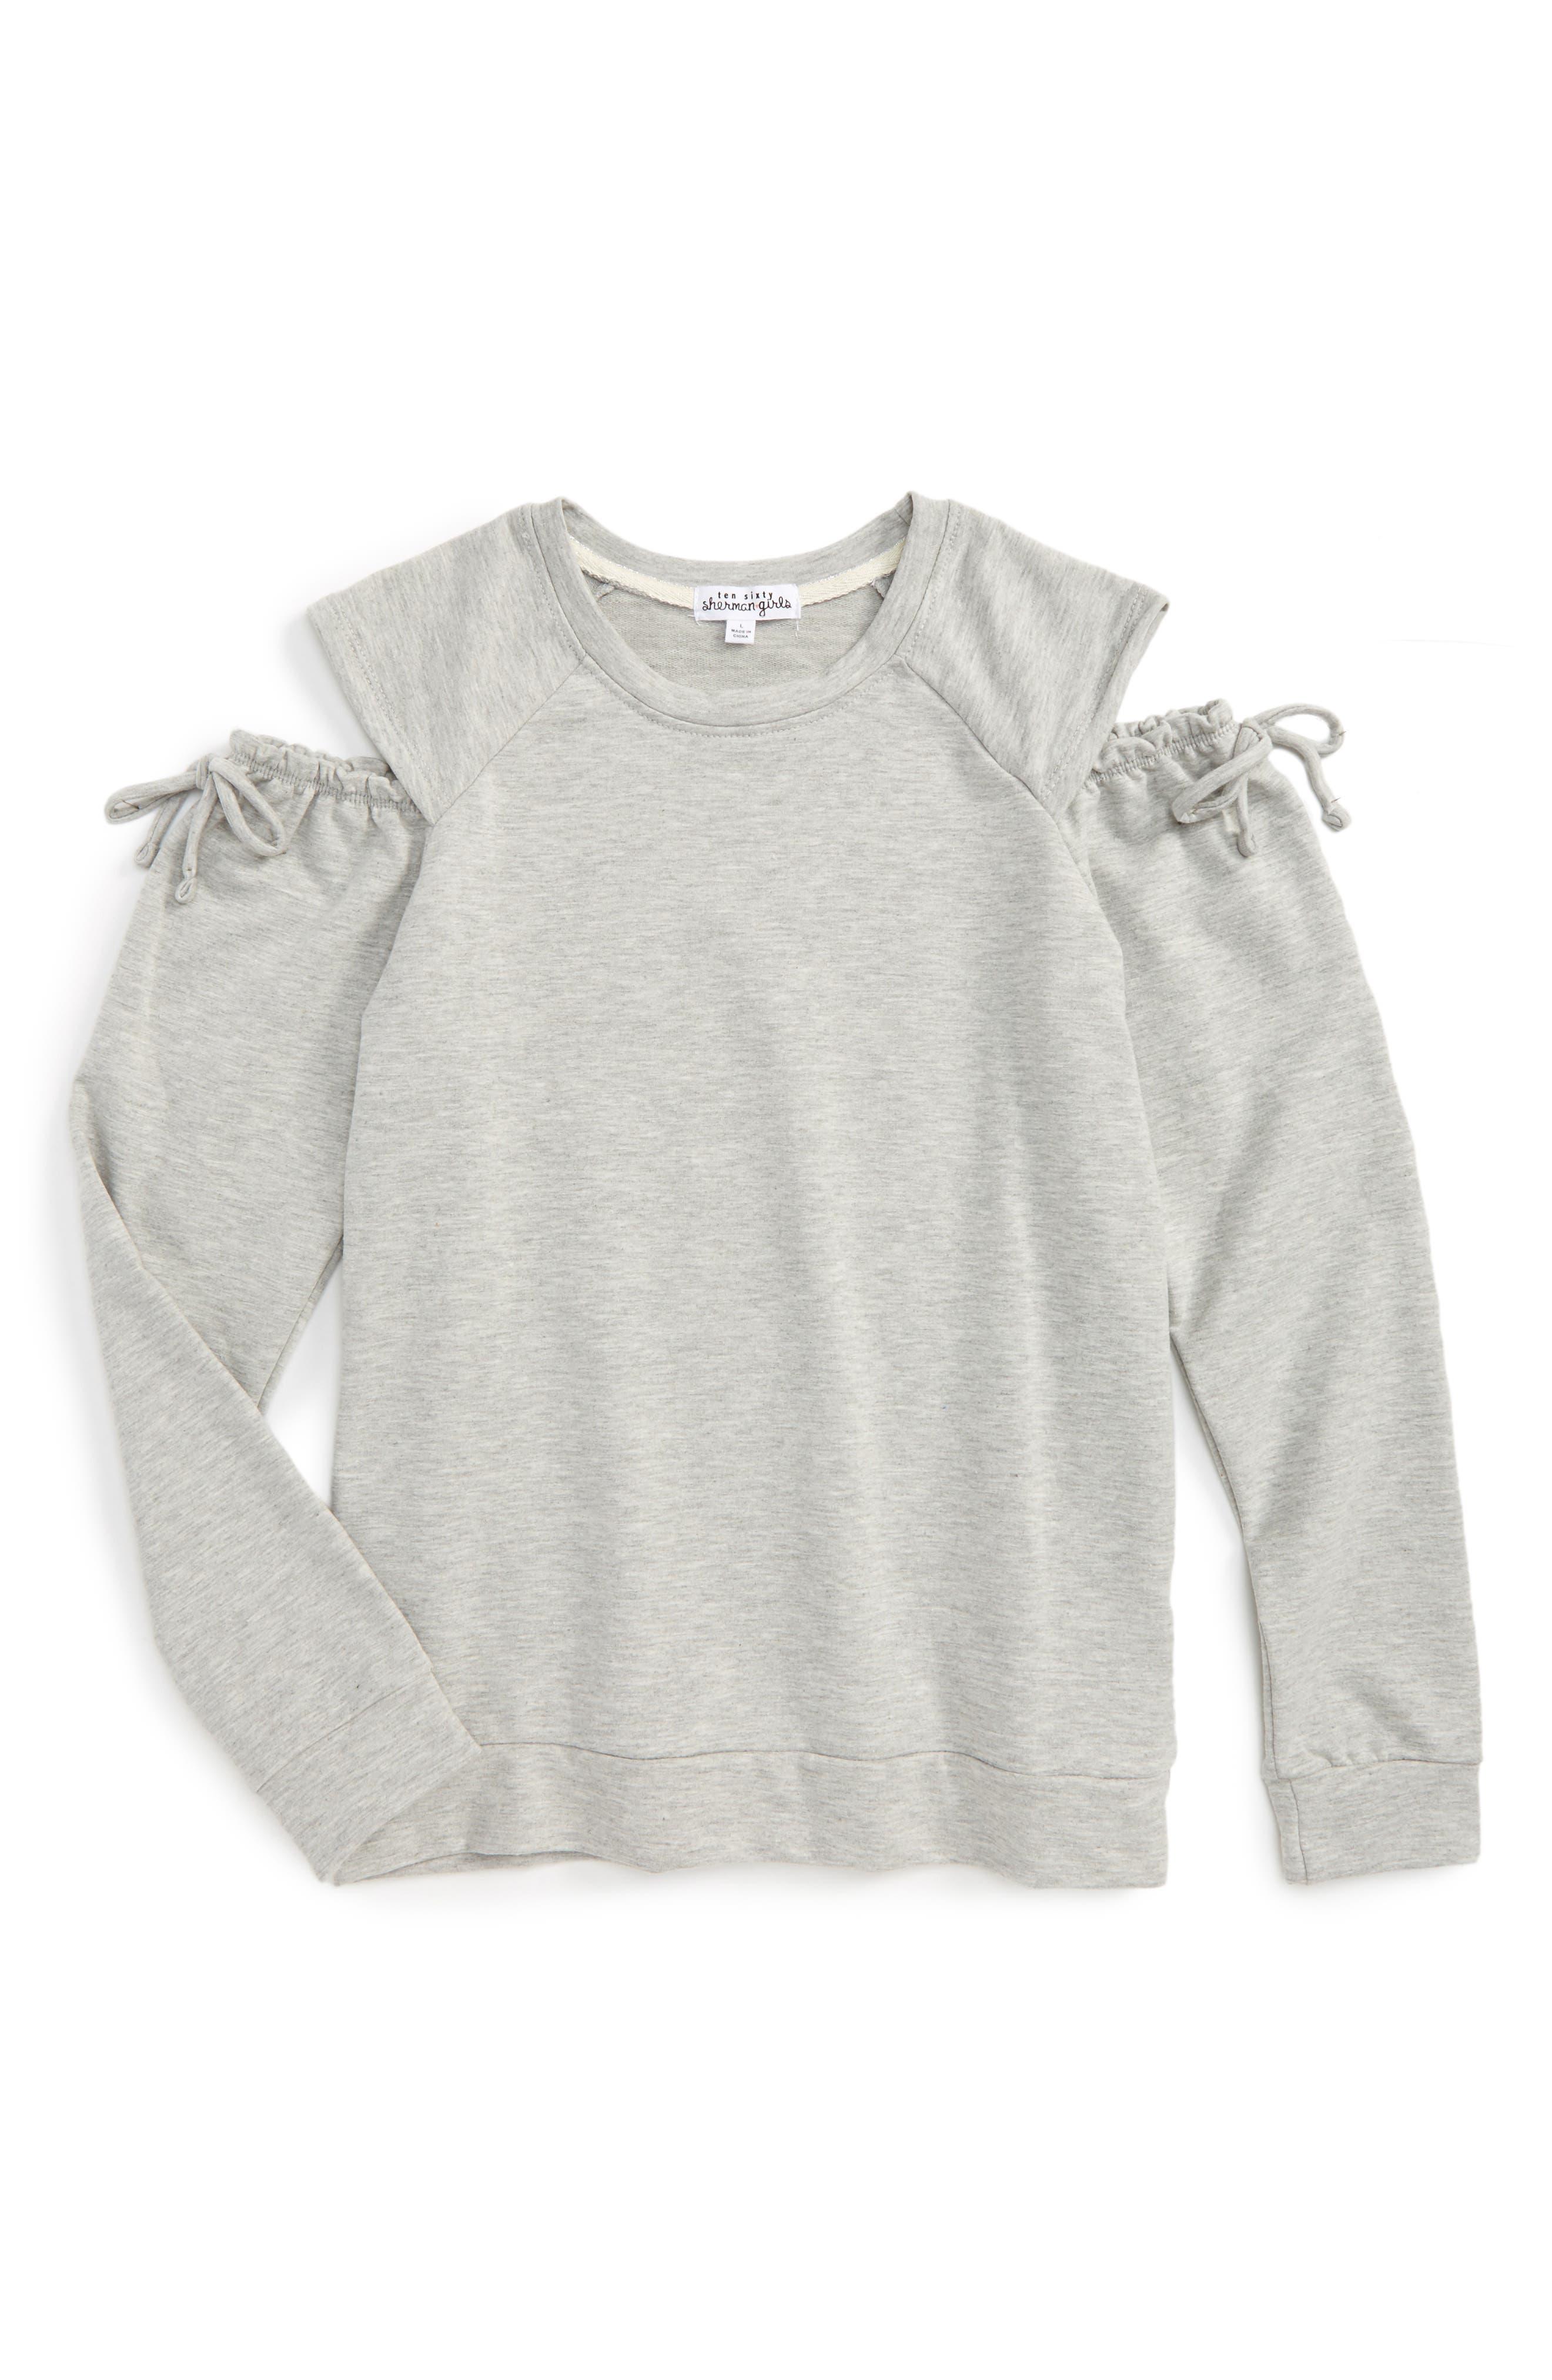 Cold Shoulder Sweatshirt,                             Main thumbnail 1, color,                             020